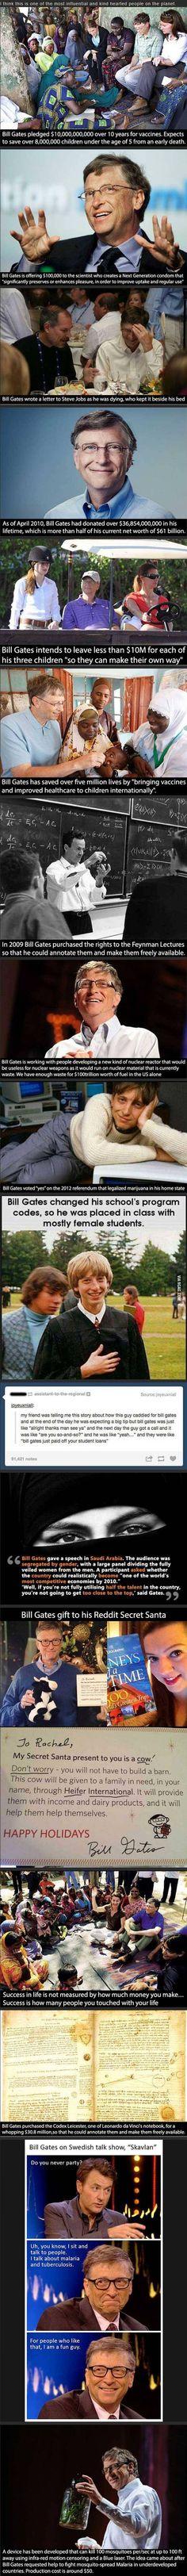 Bill Gates, everybody.